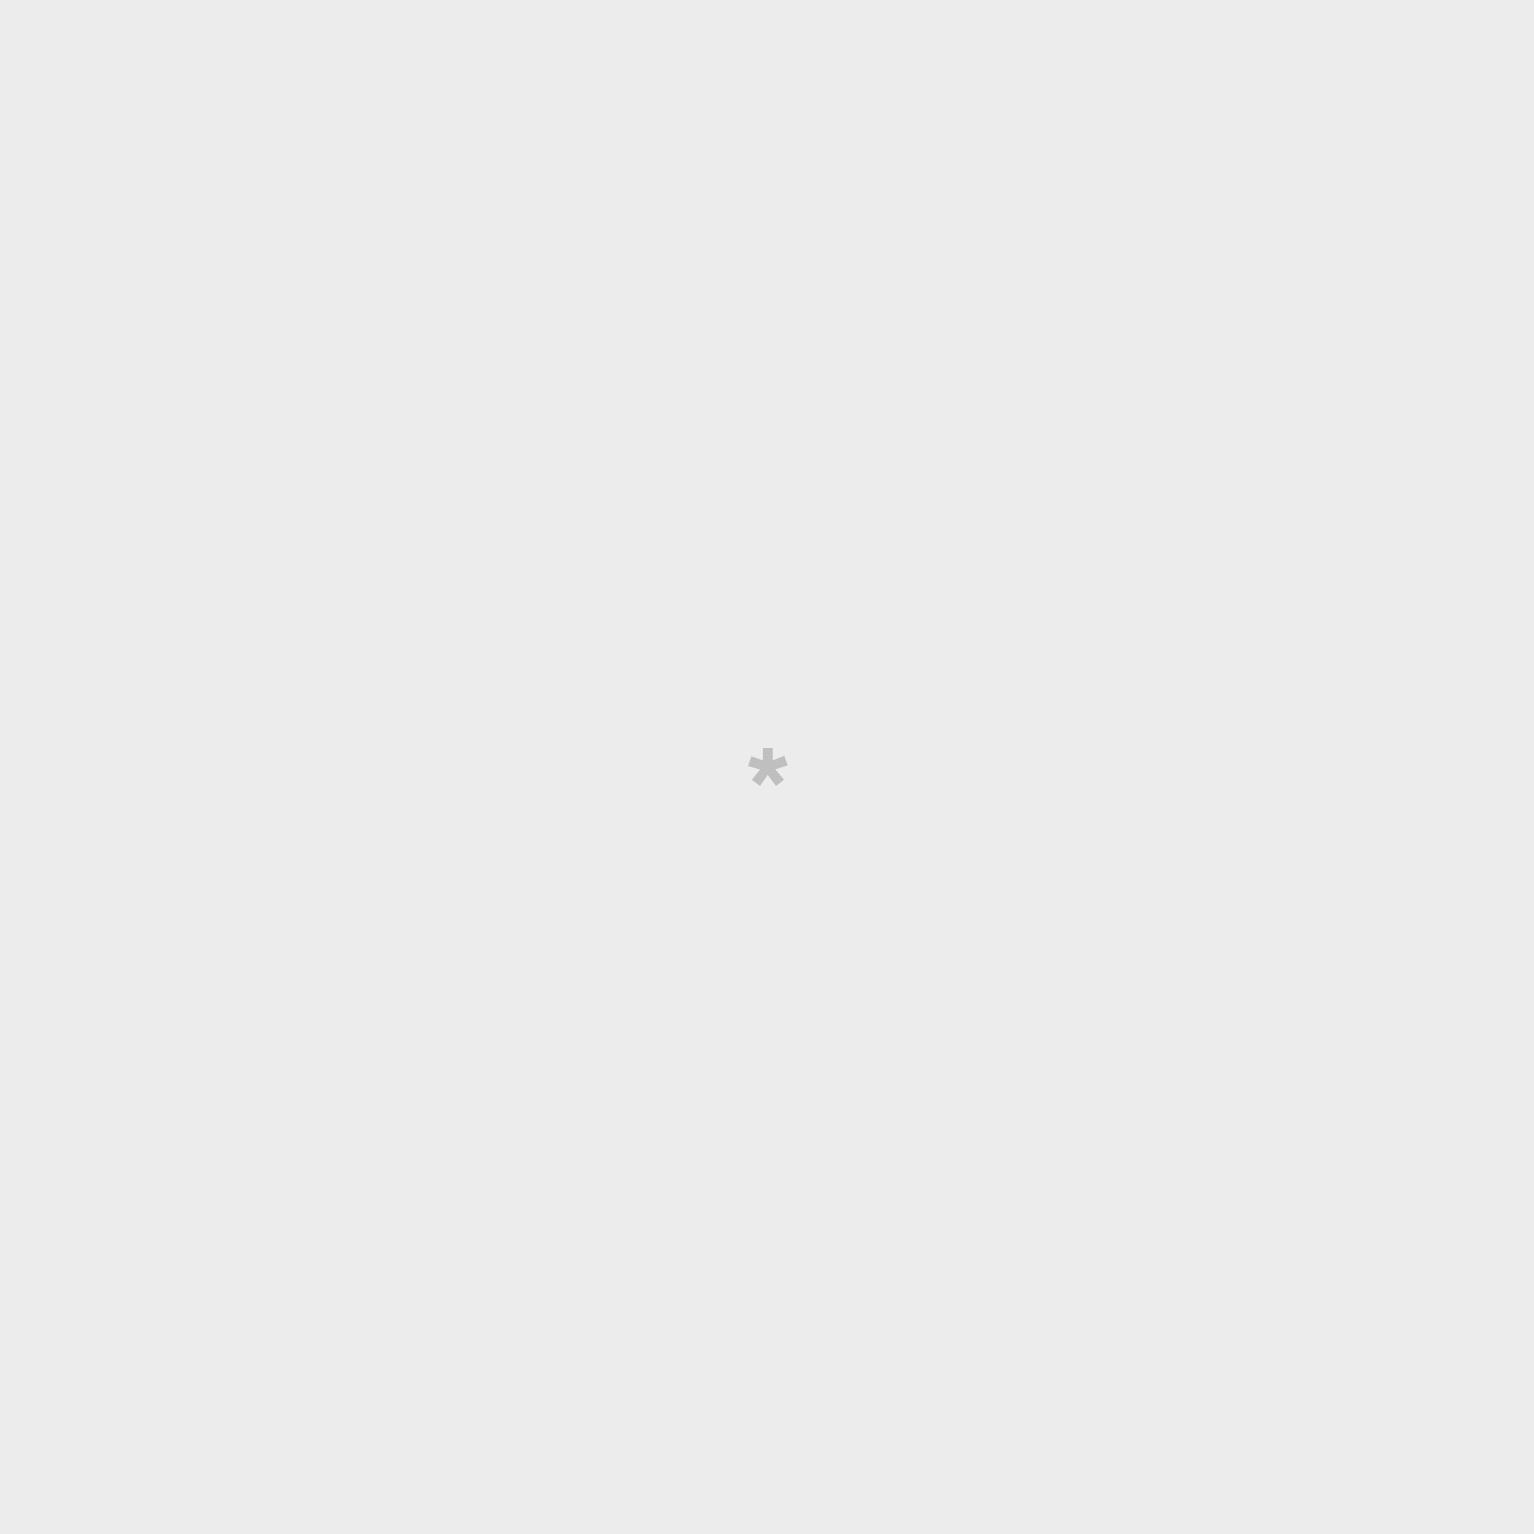 Samsung A6 Plus case - Avocados